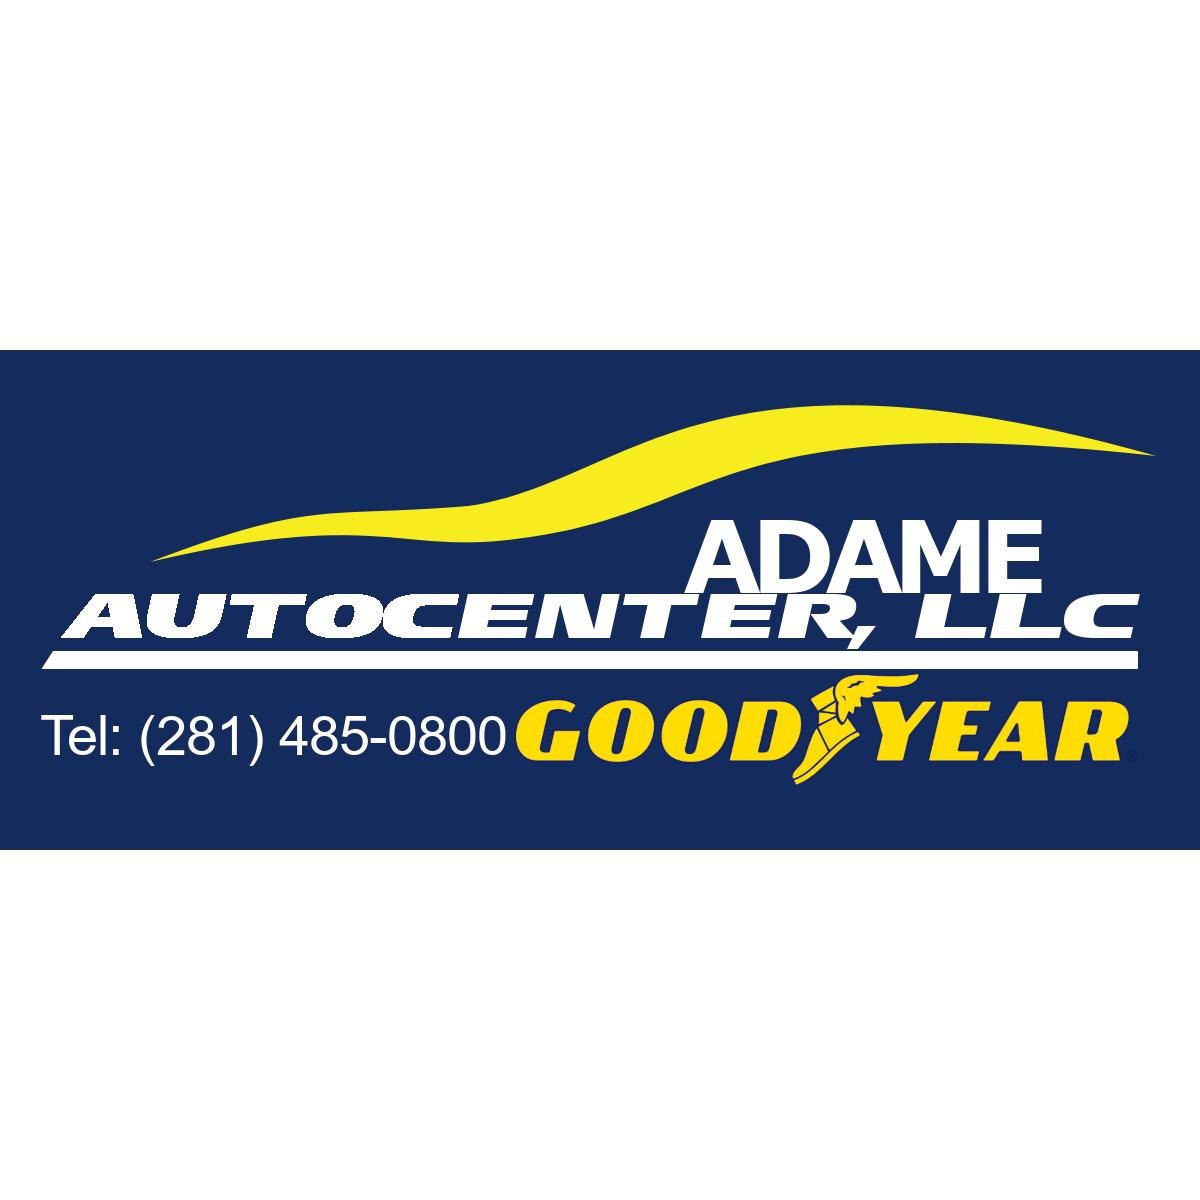 Adame Auto Center, LLC.